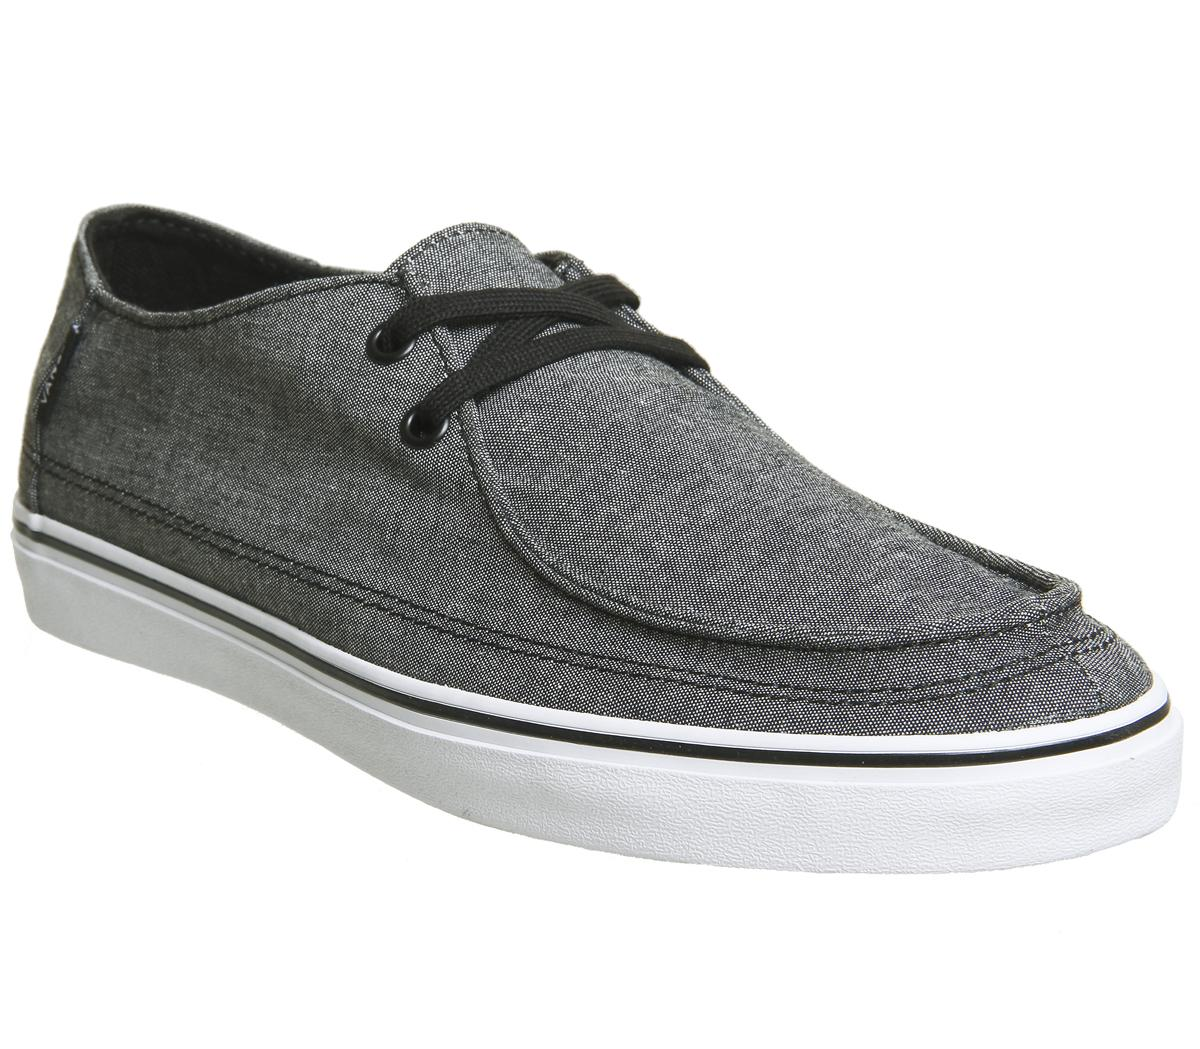 Rata Vulc Shoes